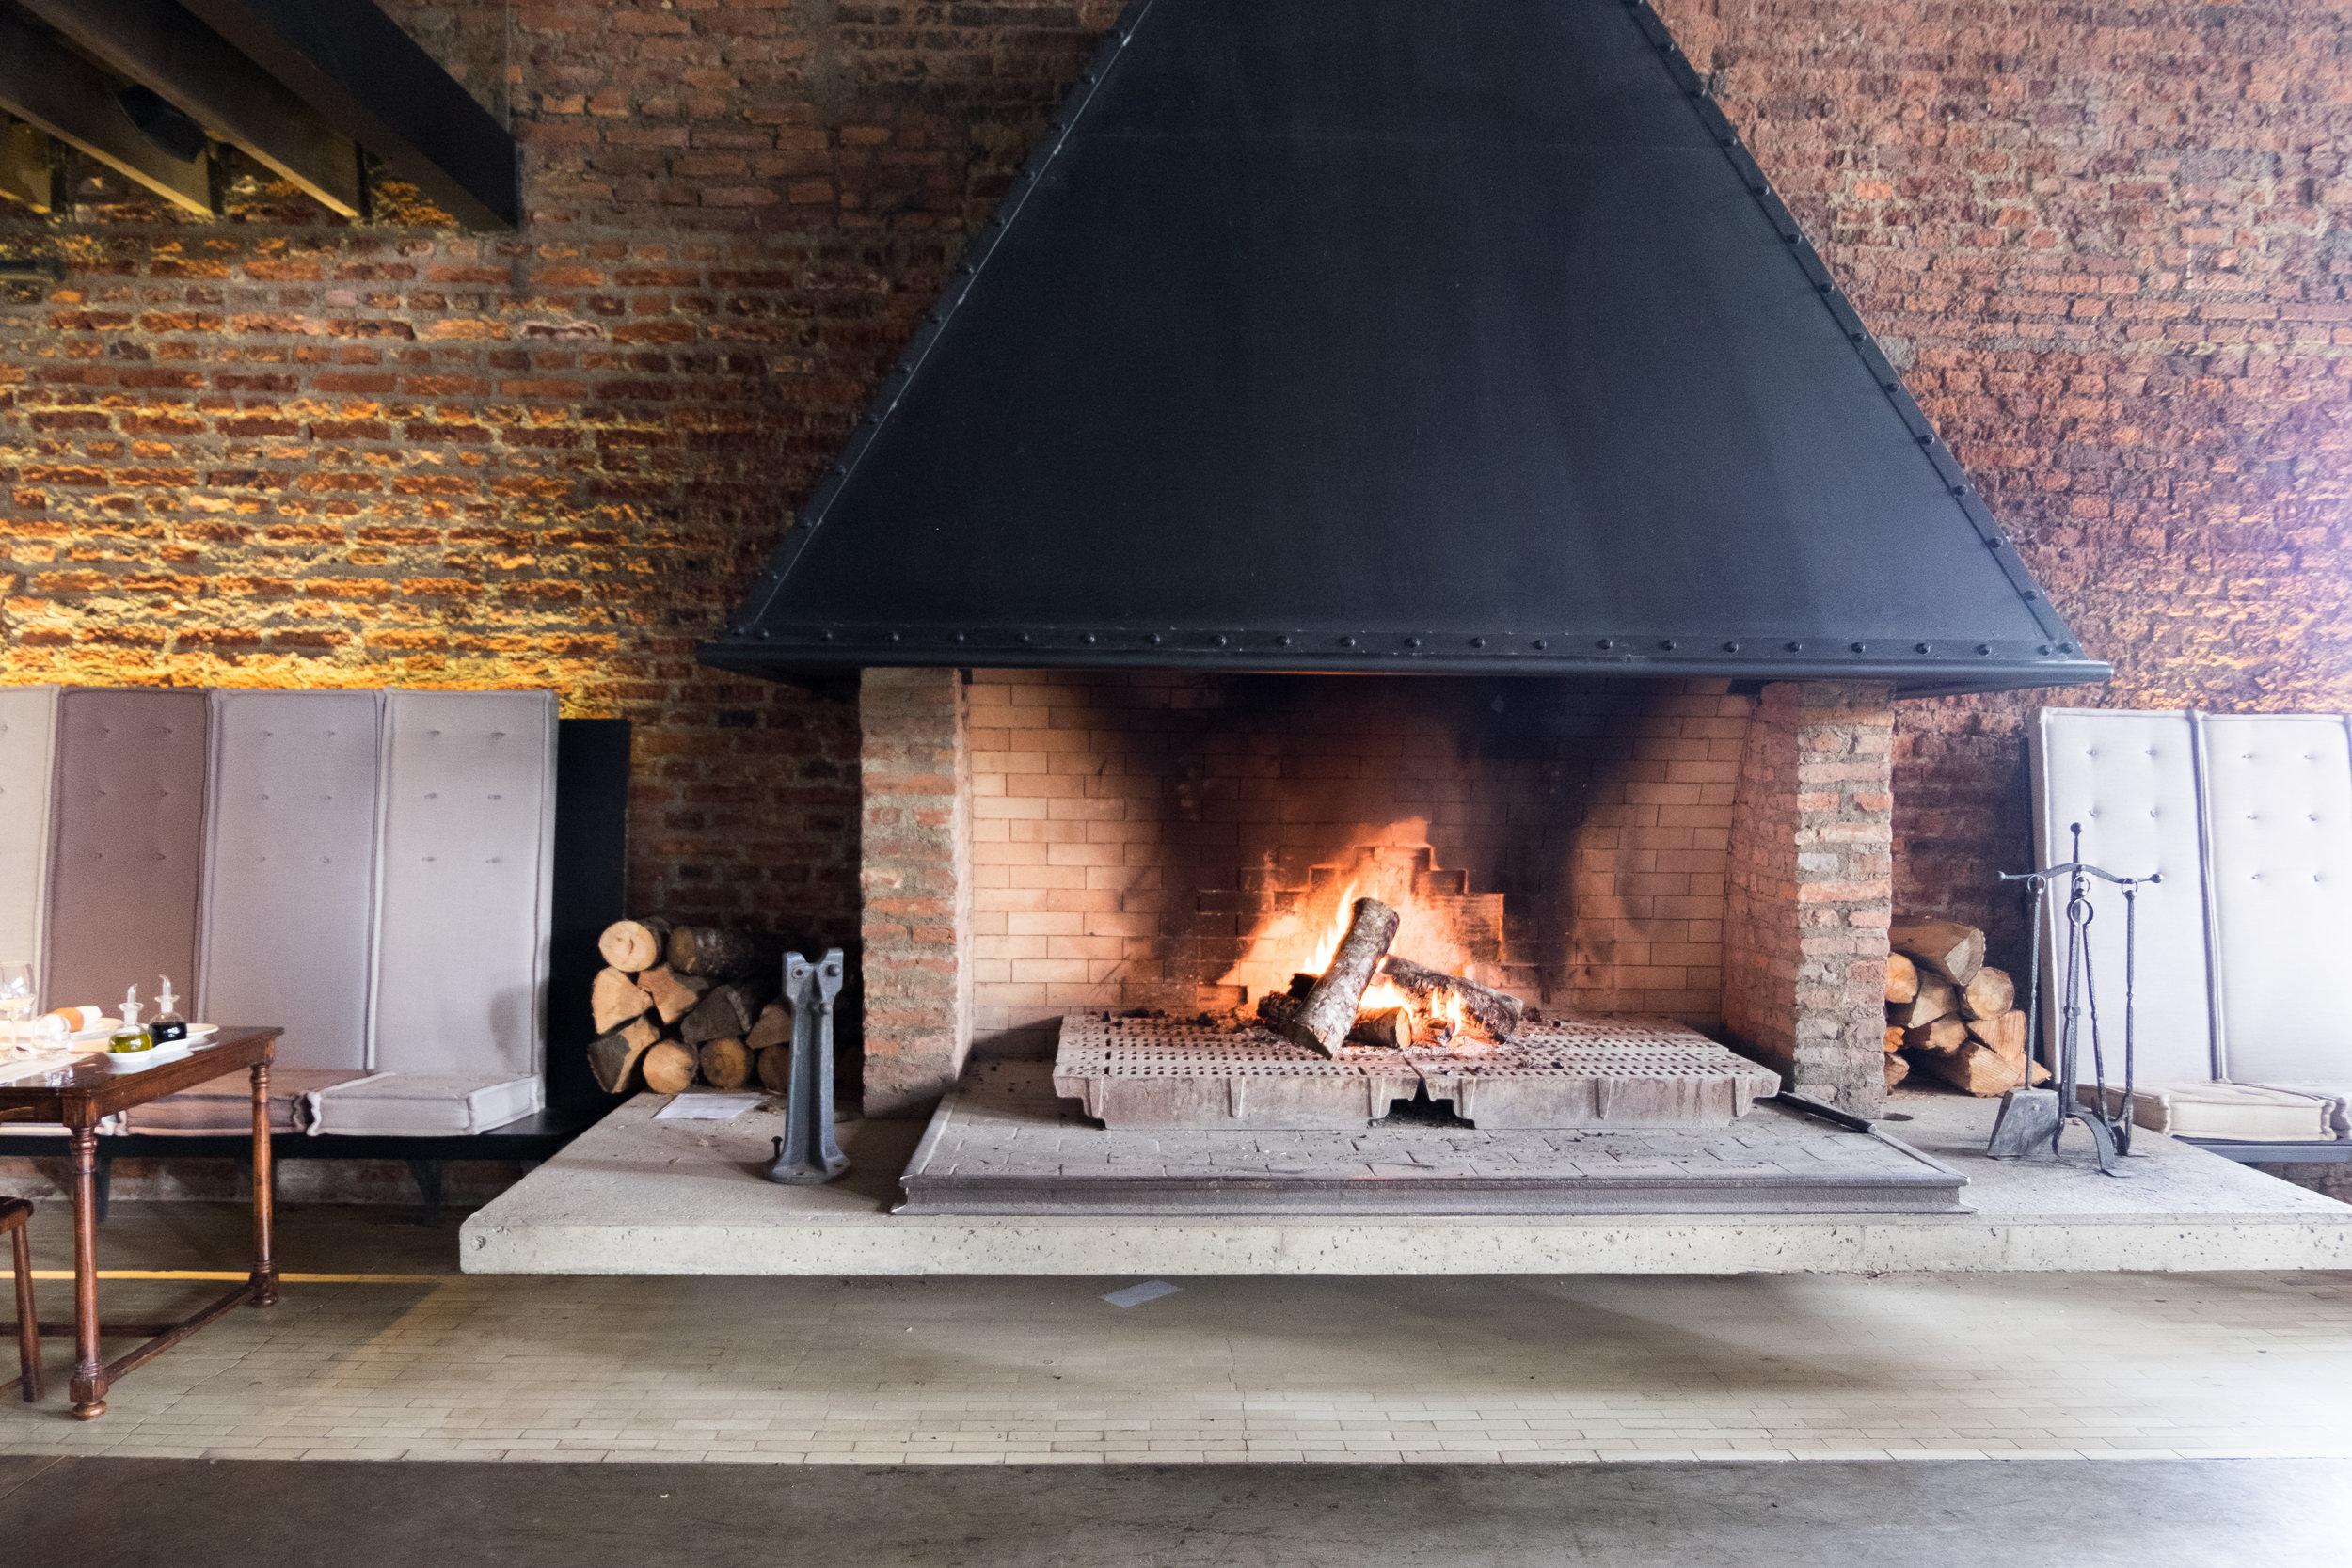 The fireplace in The Singular bar & restaurant